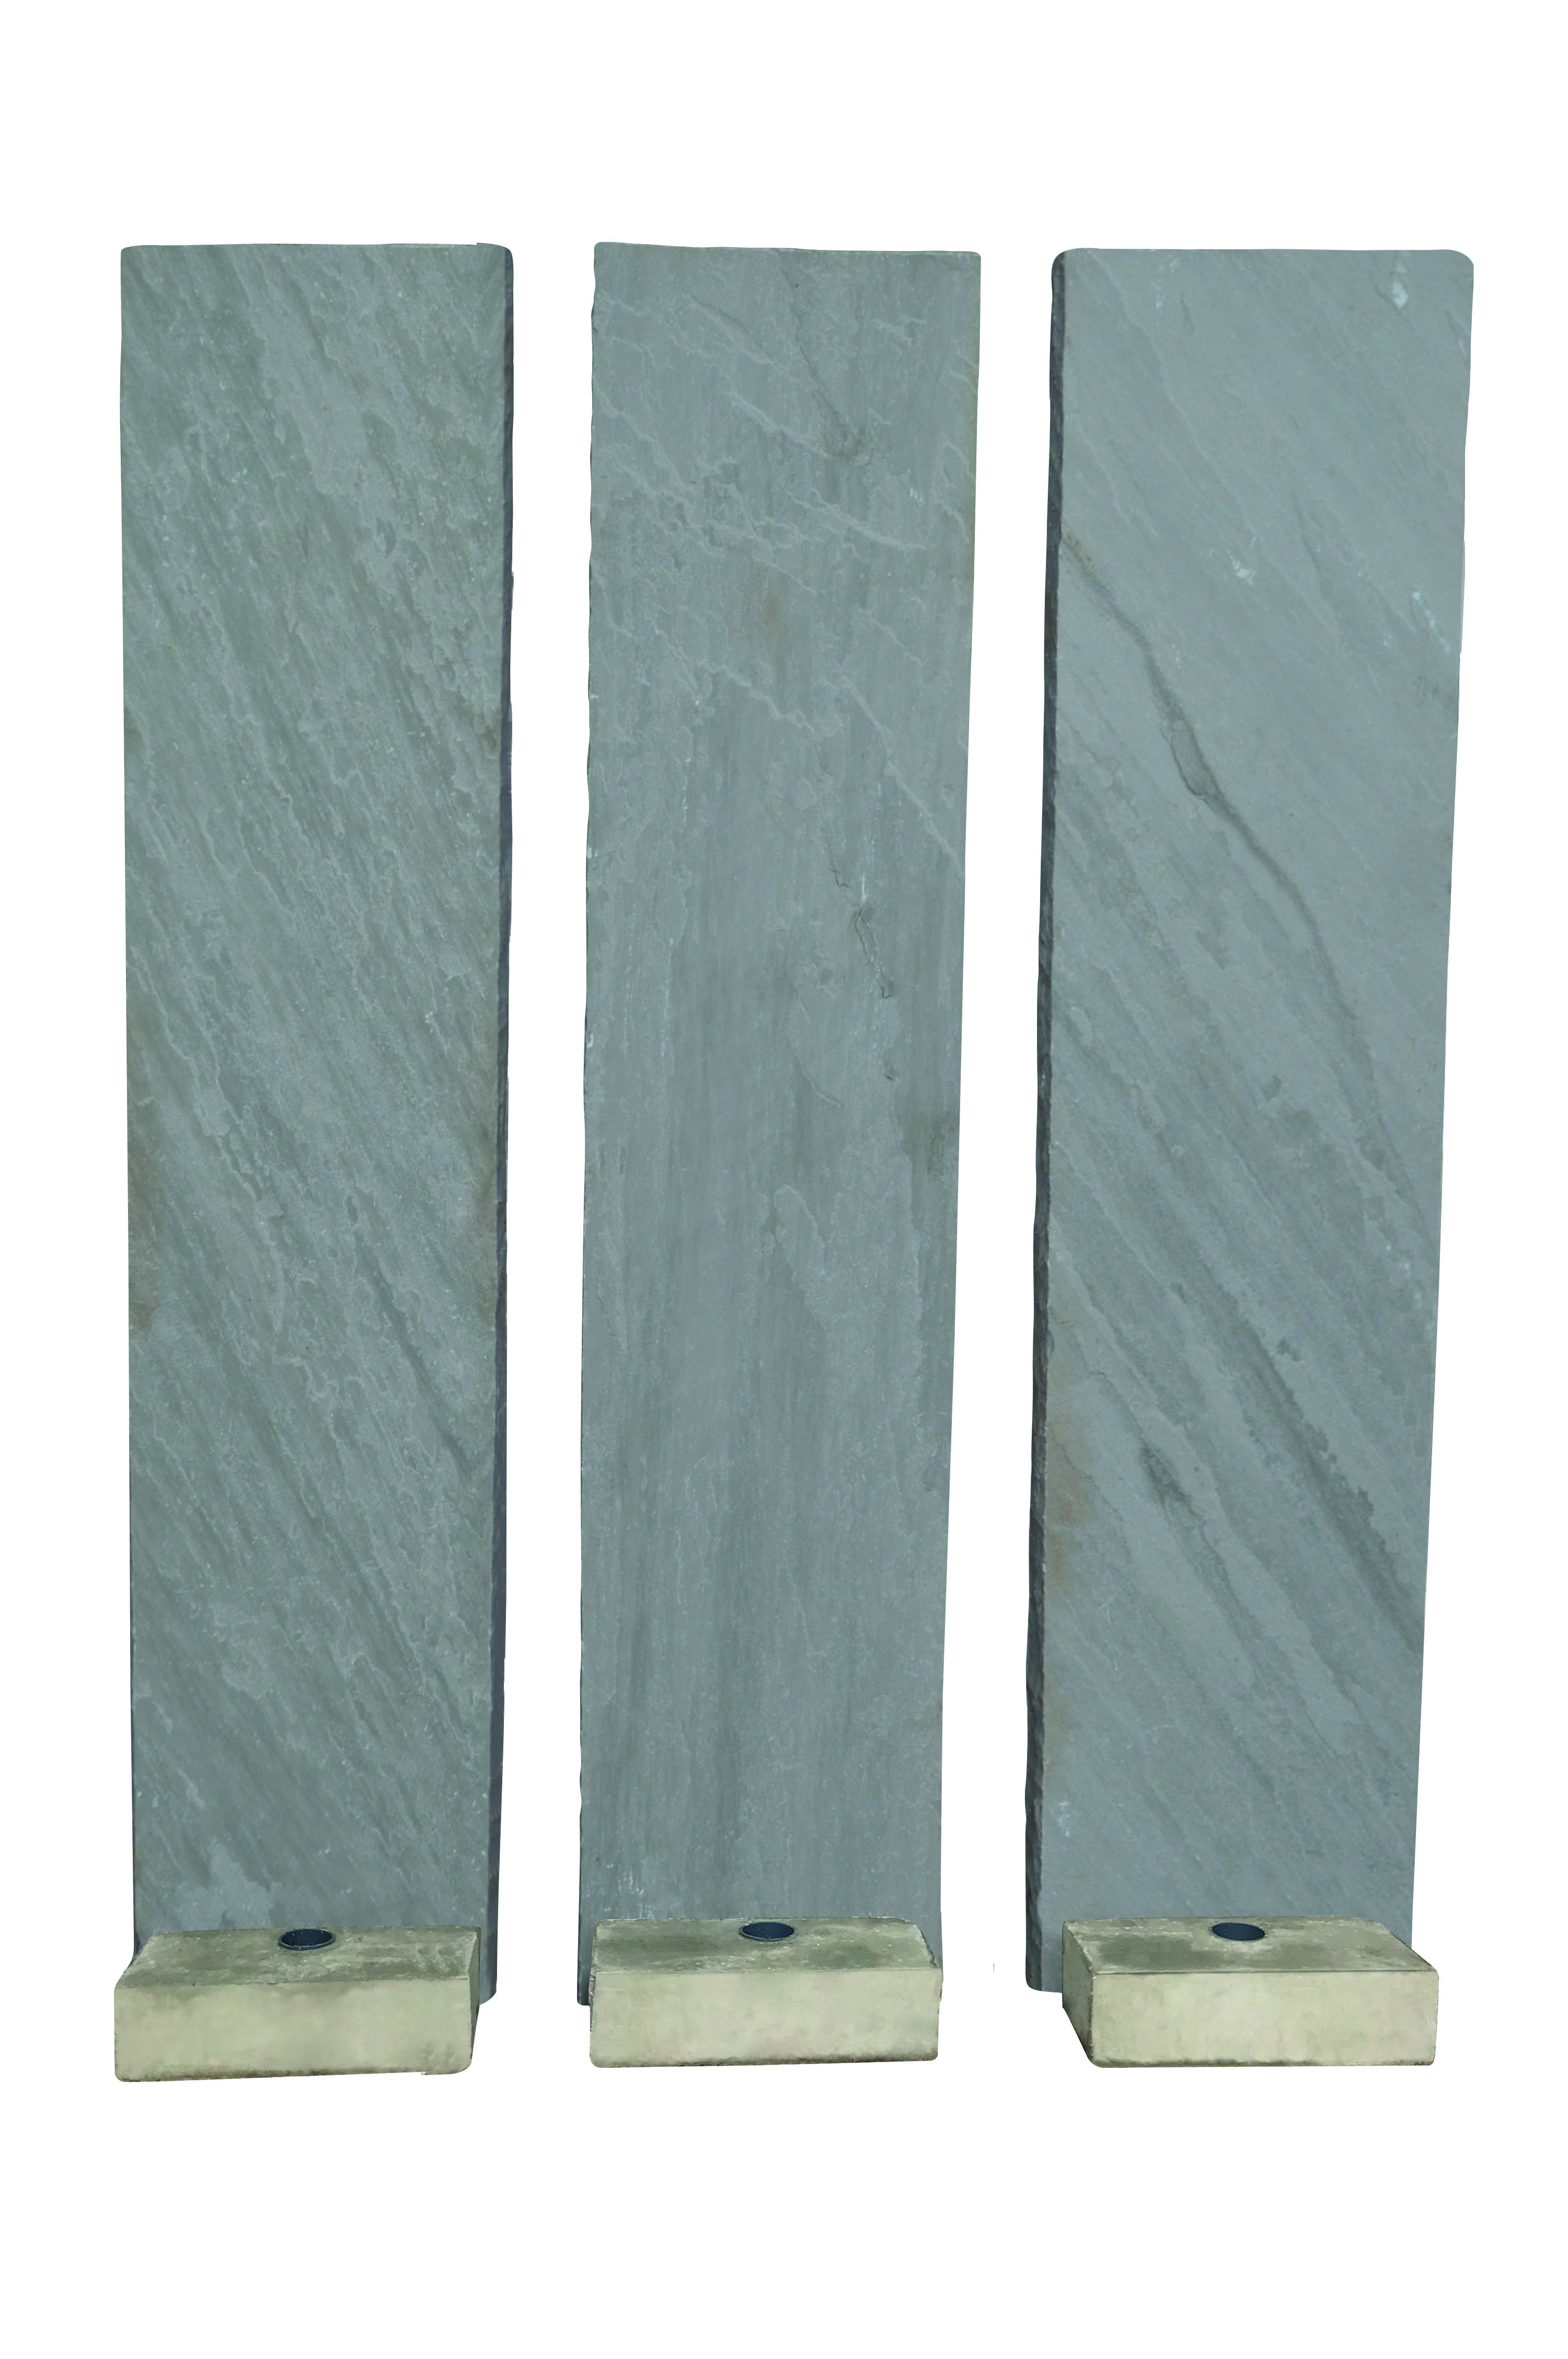 Palisade Sandstein grau Taco 200x50x4-6cm mit Betonsockel